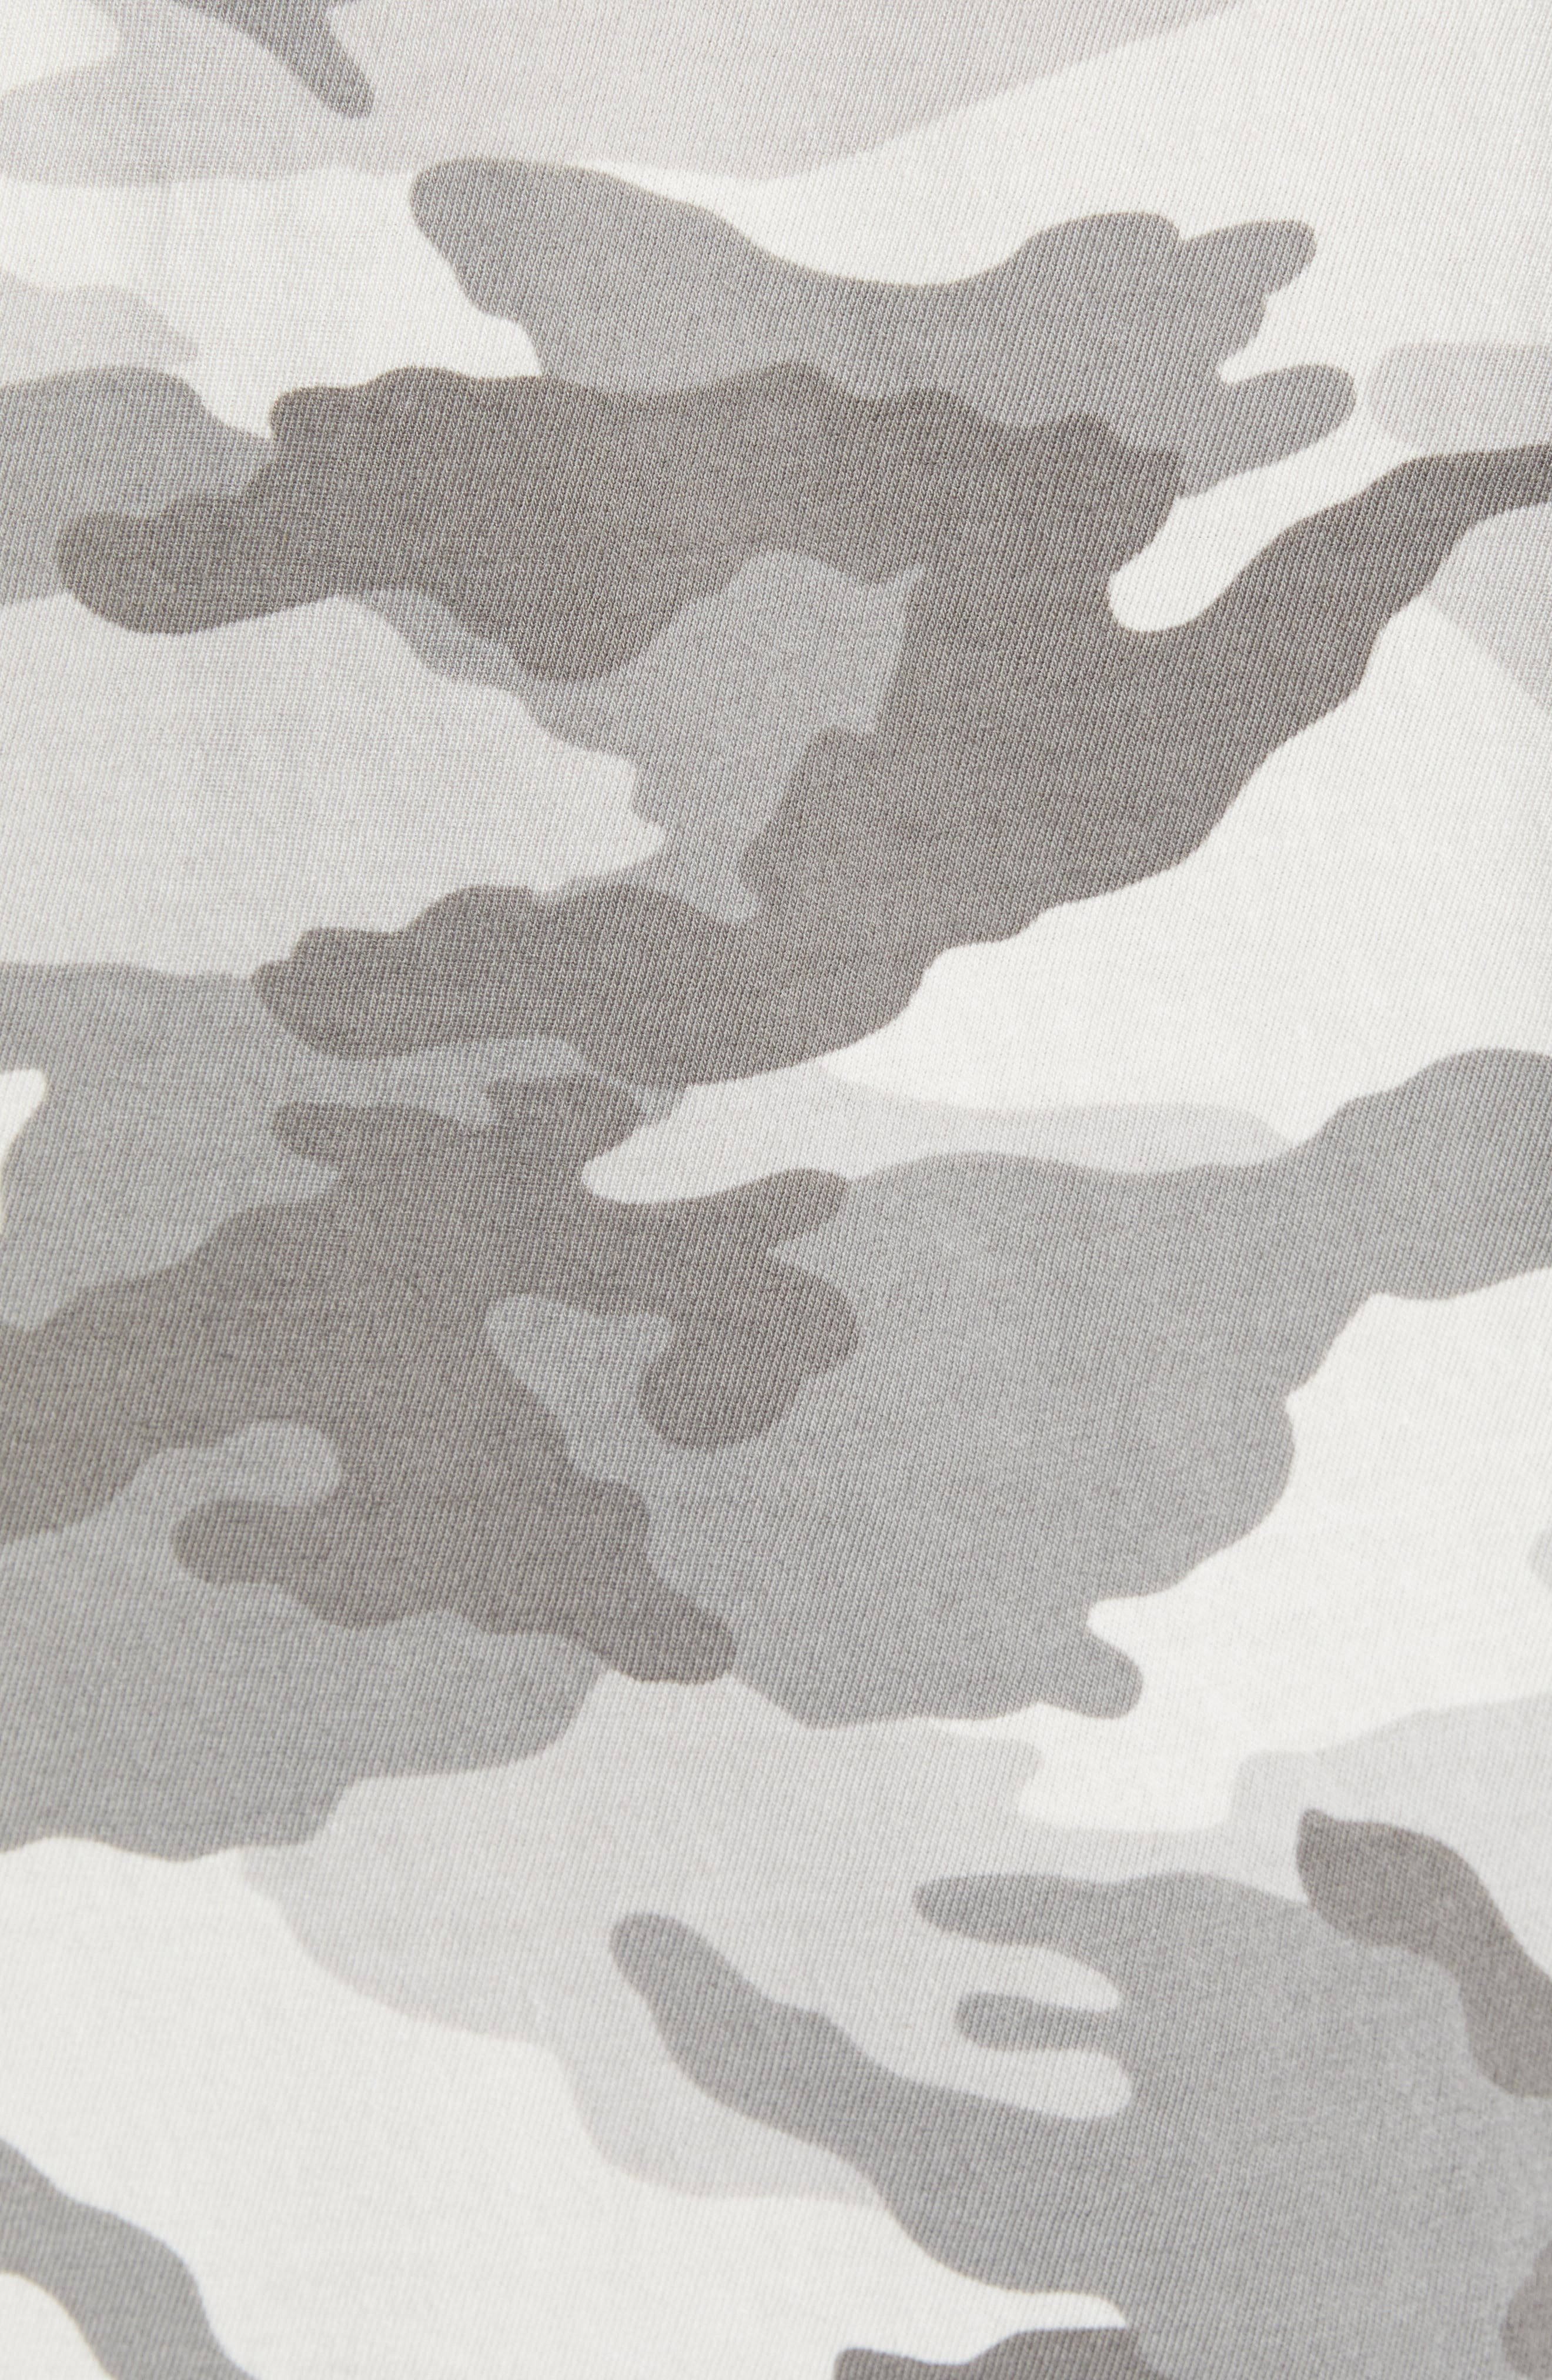 JAMES PERSE, Long Sleeve Yosemite Camo Sweatshirt, Alternate thumbnail 5, color, MIST CAMO